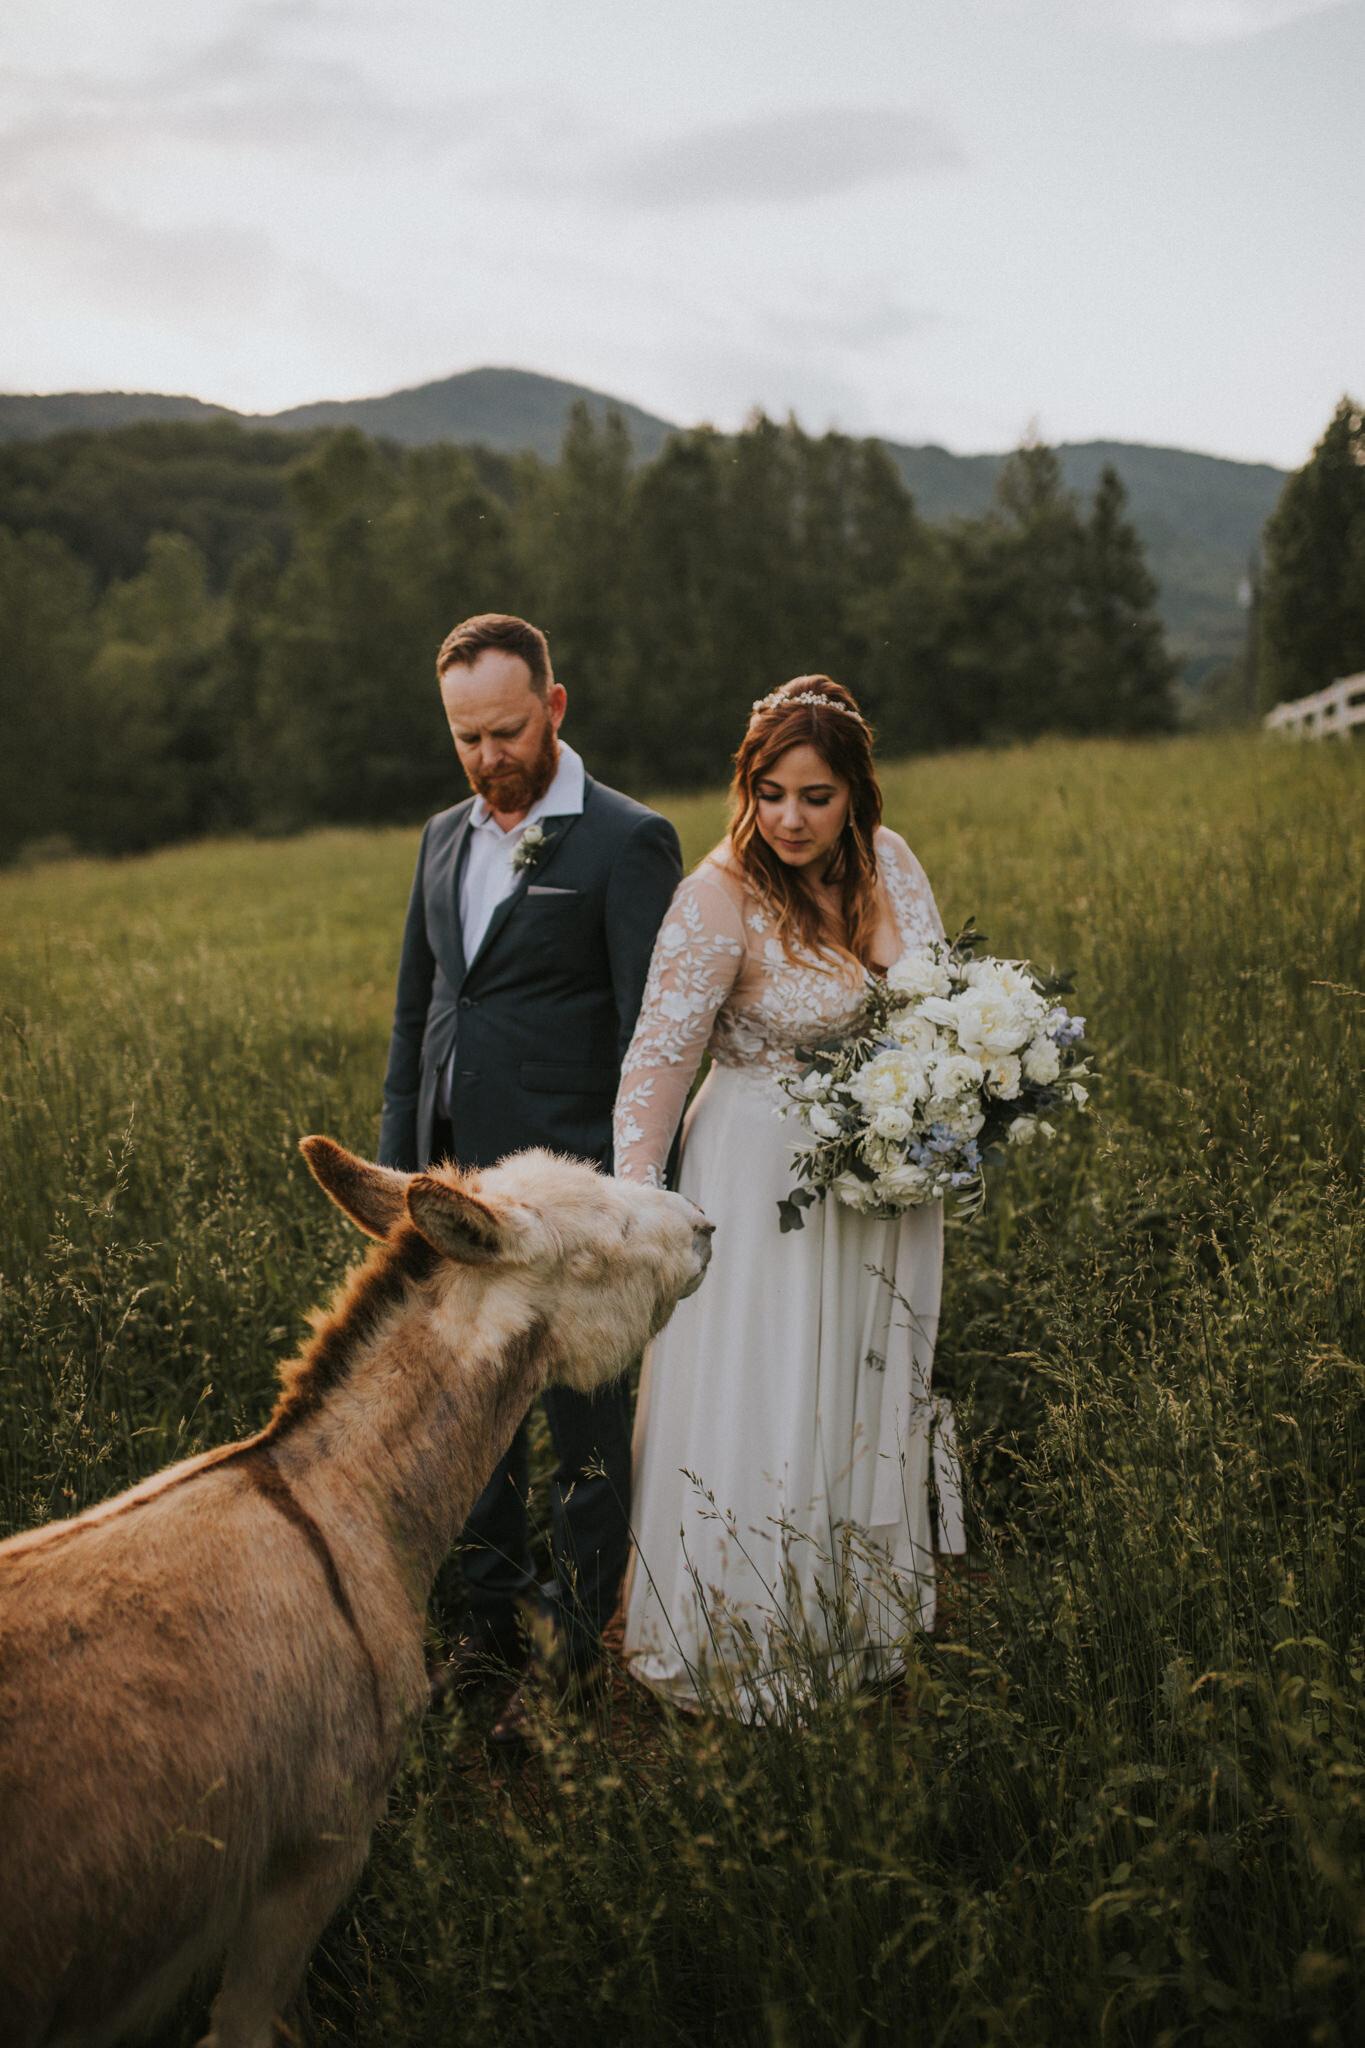 KateMatt-North-Georgia-Wedding-Photographer-Mountain-Laurel-Farm-145.jpg